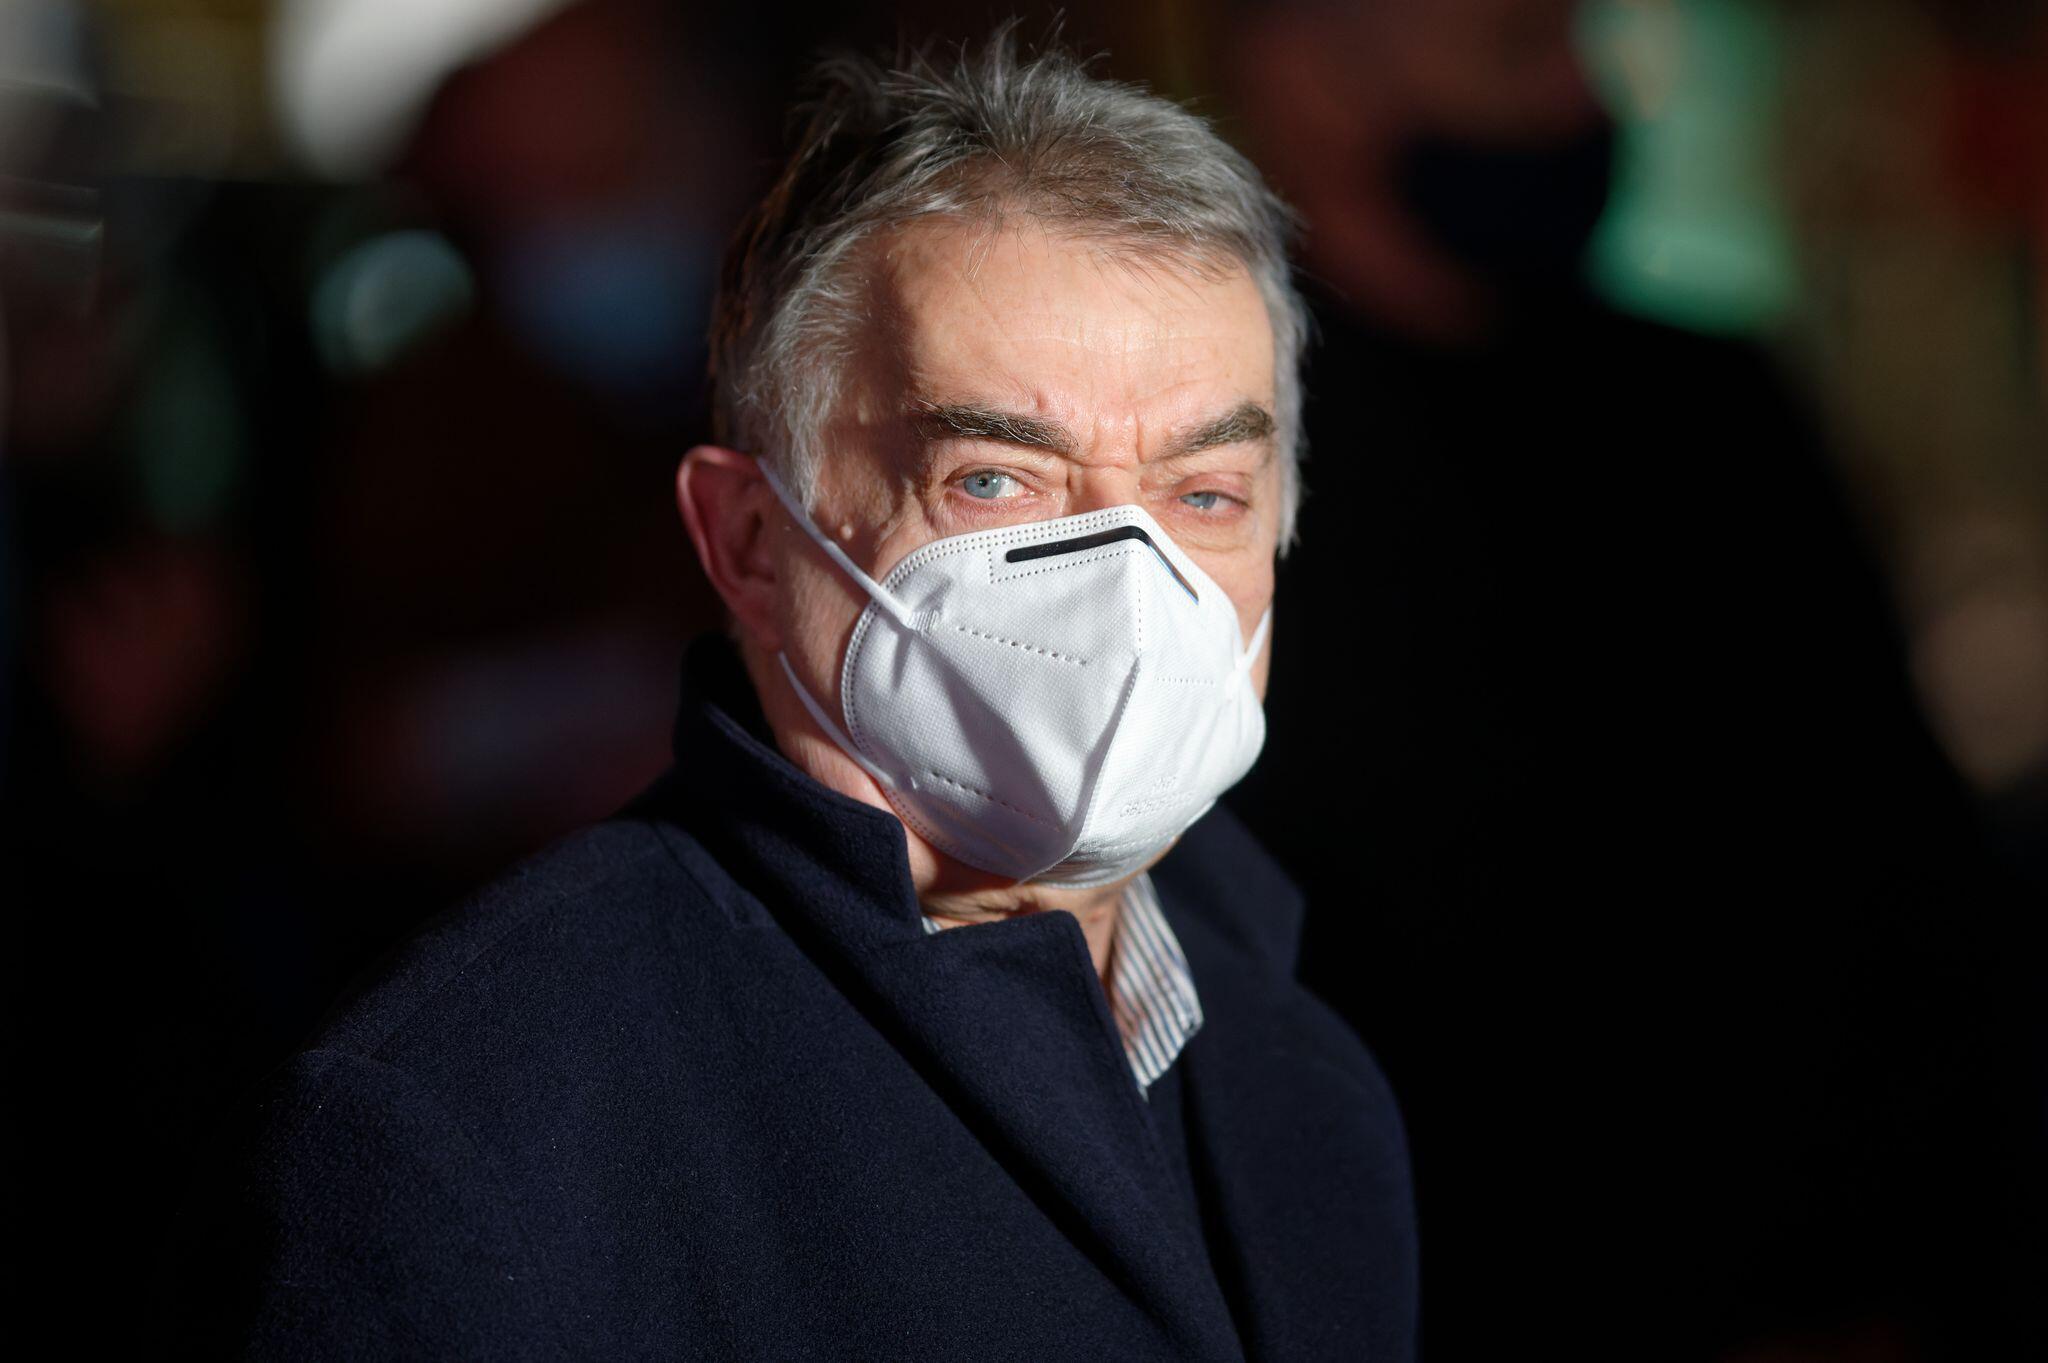 Bild zu Coronavirus - NRW-Innenminister Reul positiv getestet